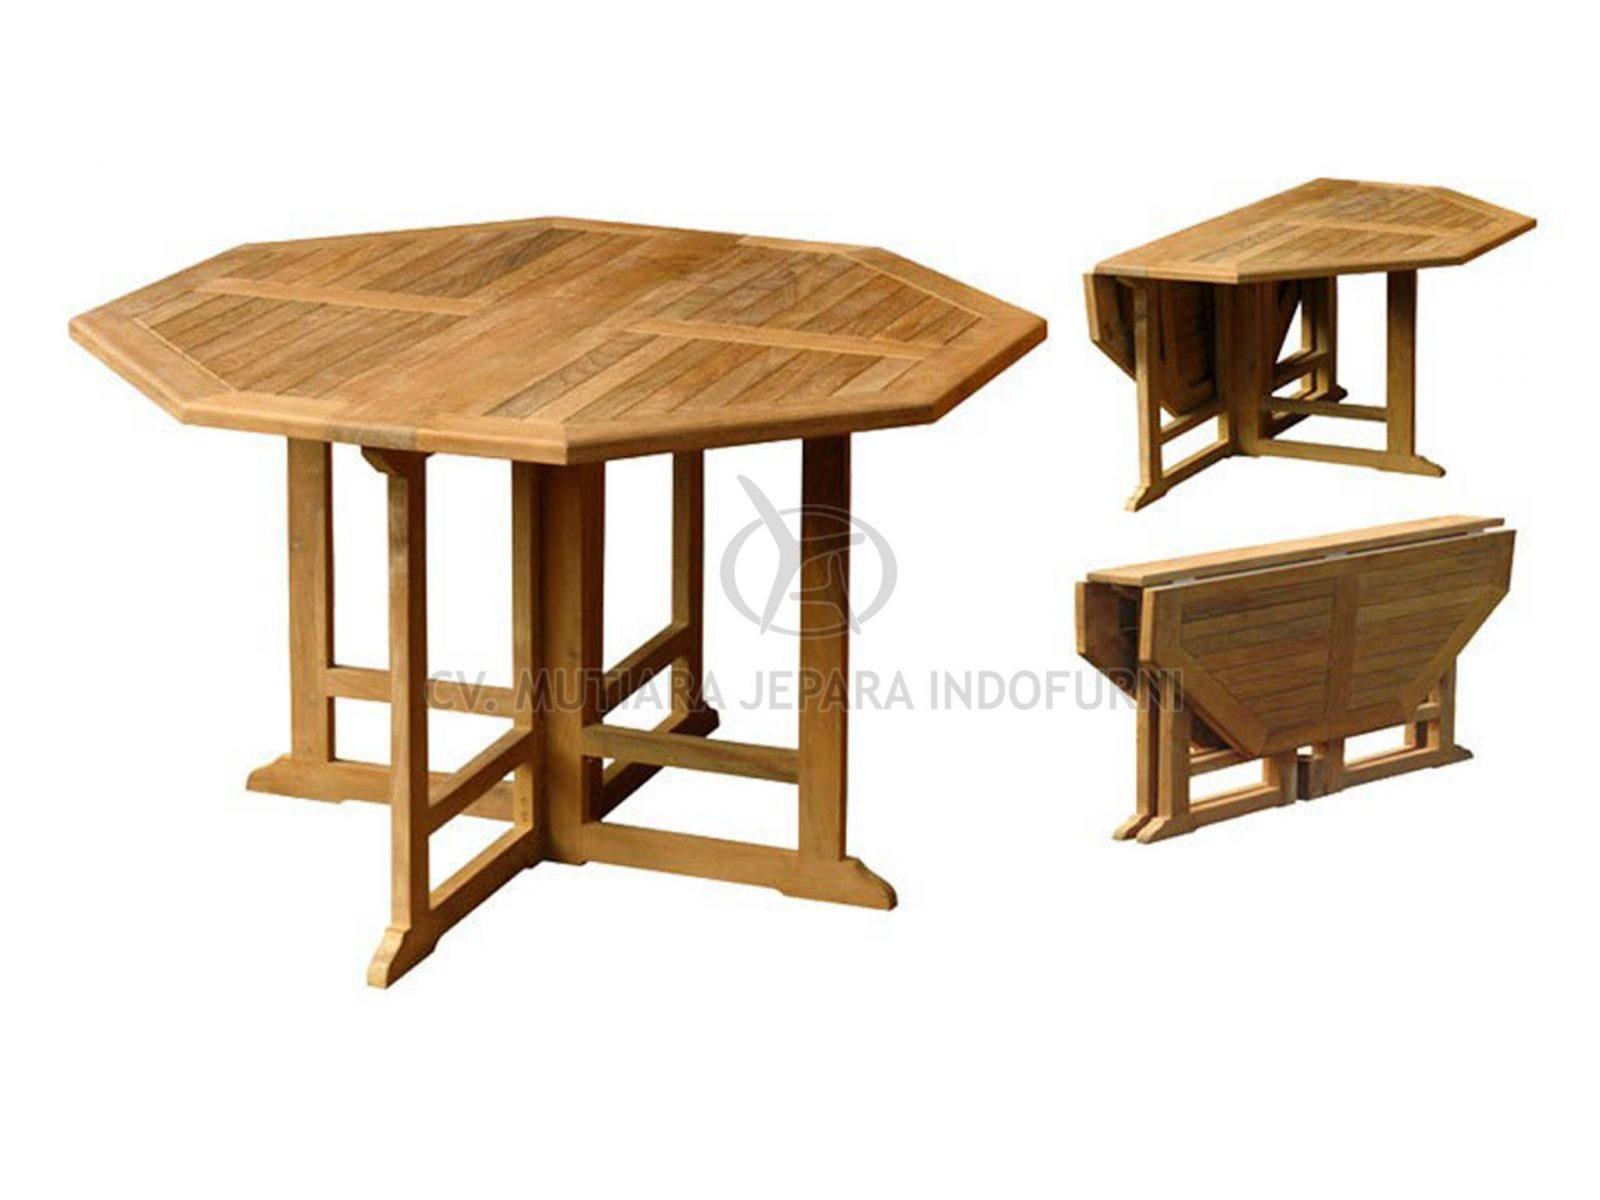 Octagonal Gateleg Table 6 - Indonesia Furniture Manufacturer